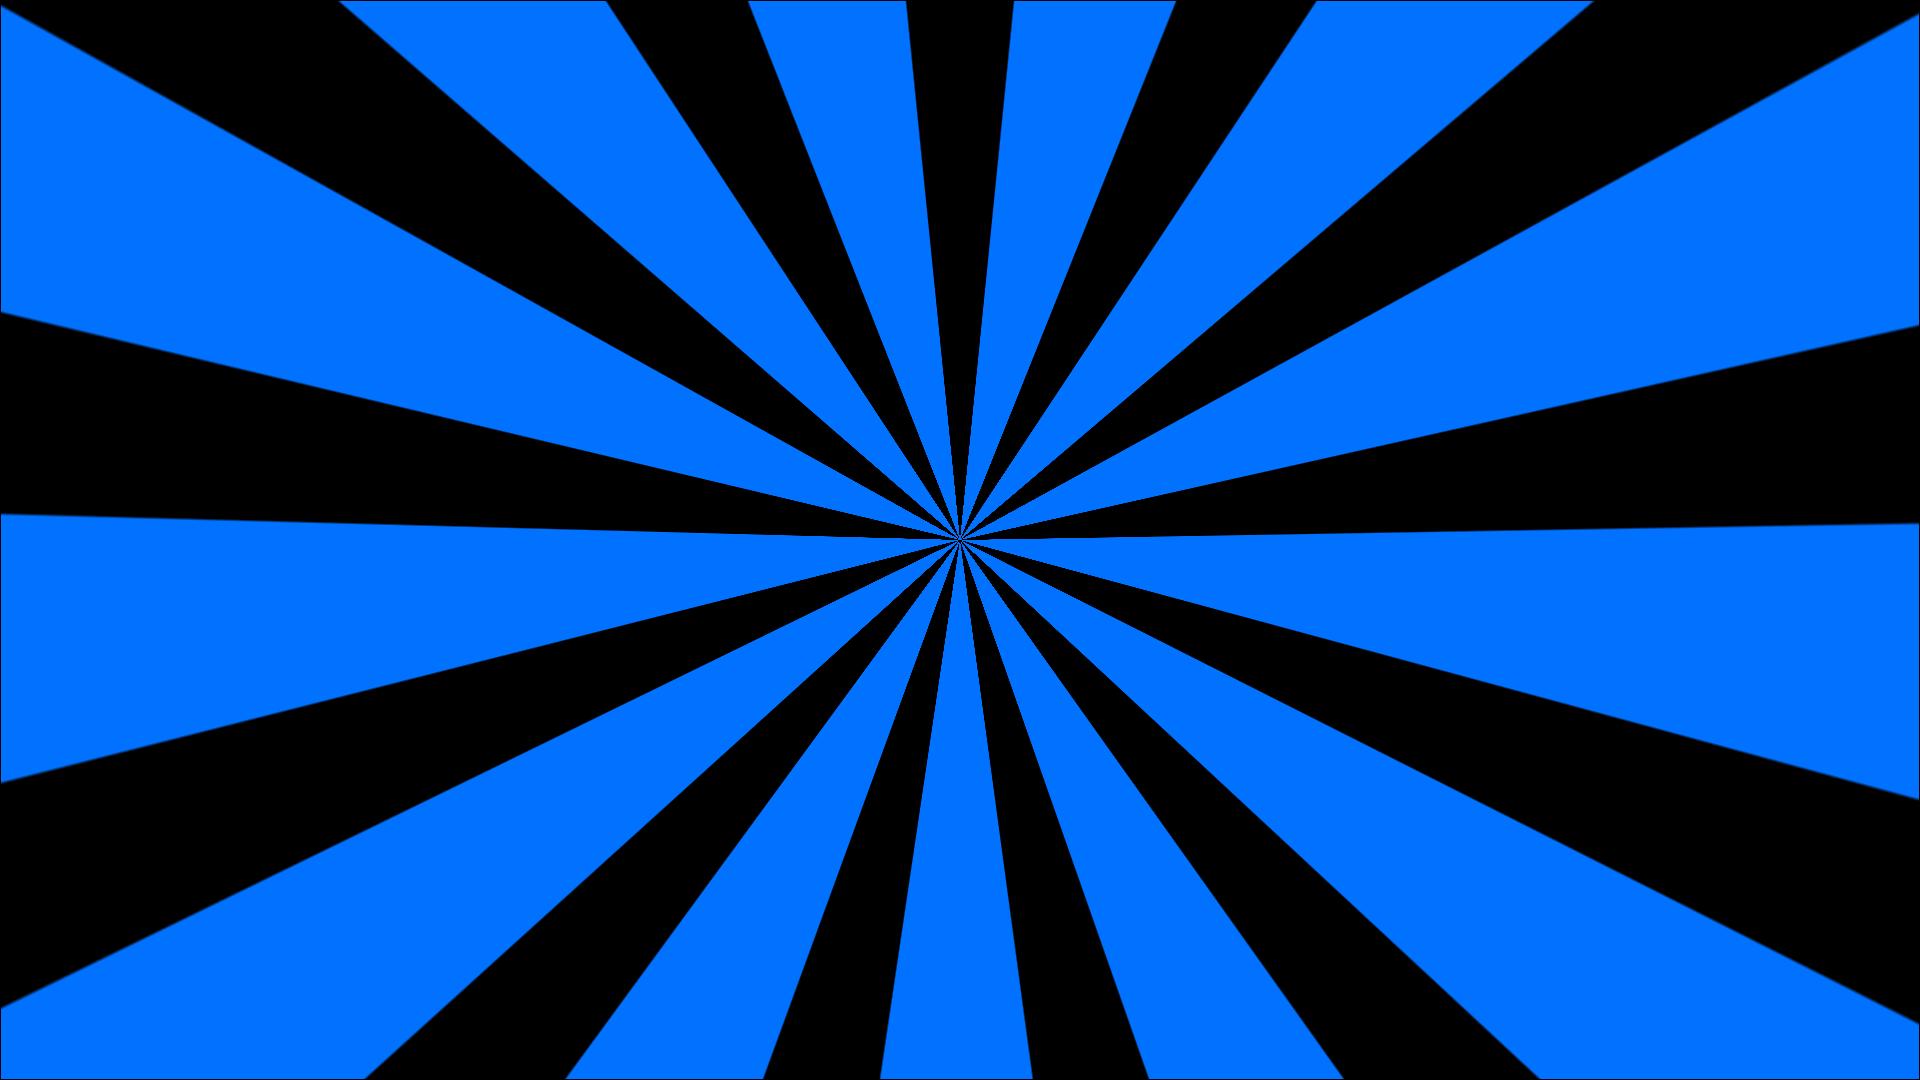 . PlusPng.com Dark Blue/Black Starburst by watchmebop - Starburst PNG HD